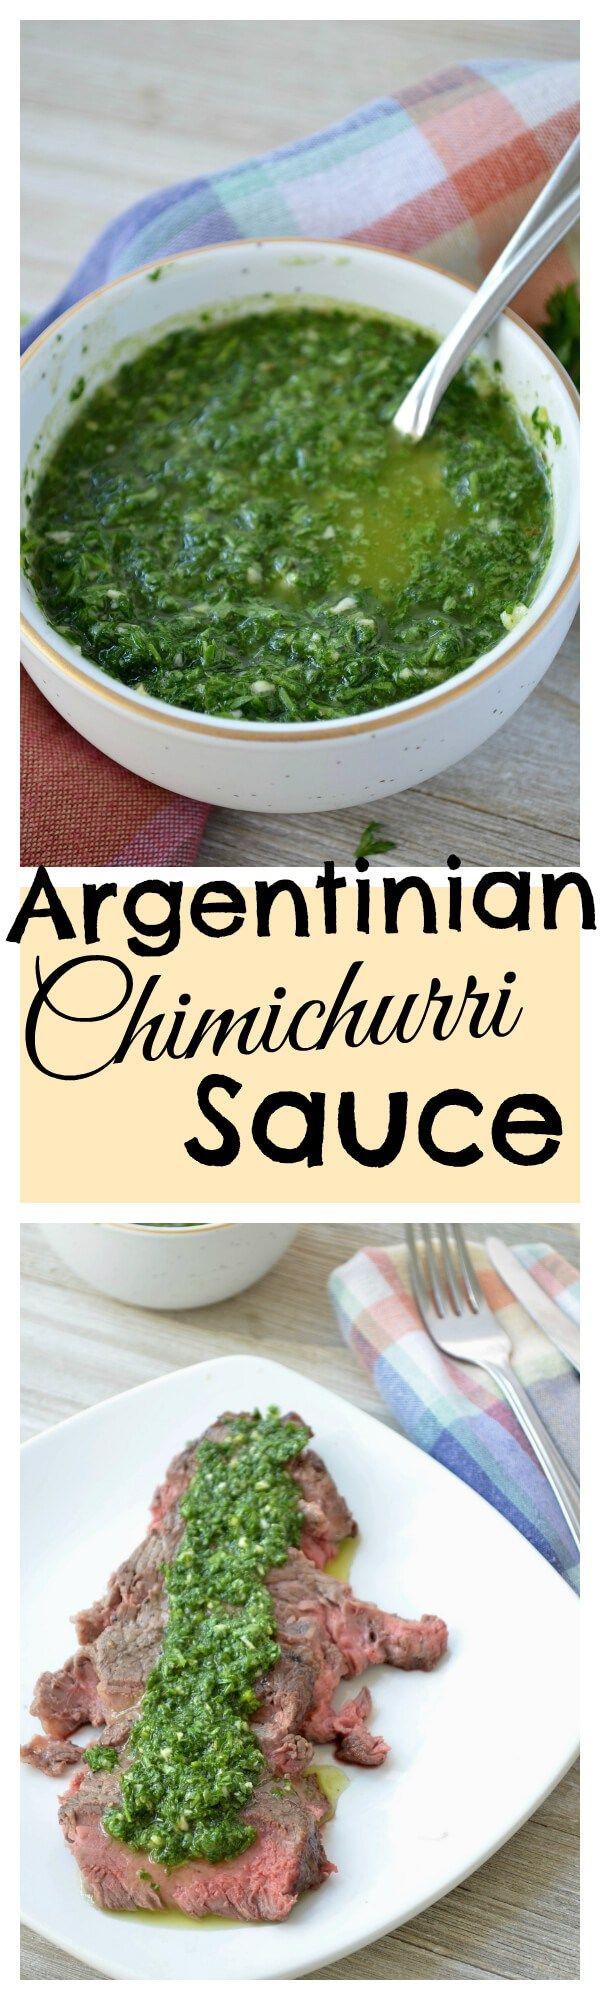 Chimichurri Sauce [Argentina] - Lyndsay's Travel Kitchen